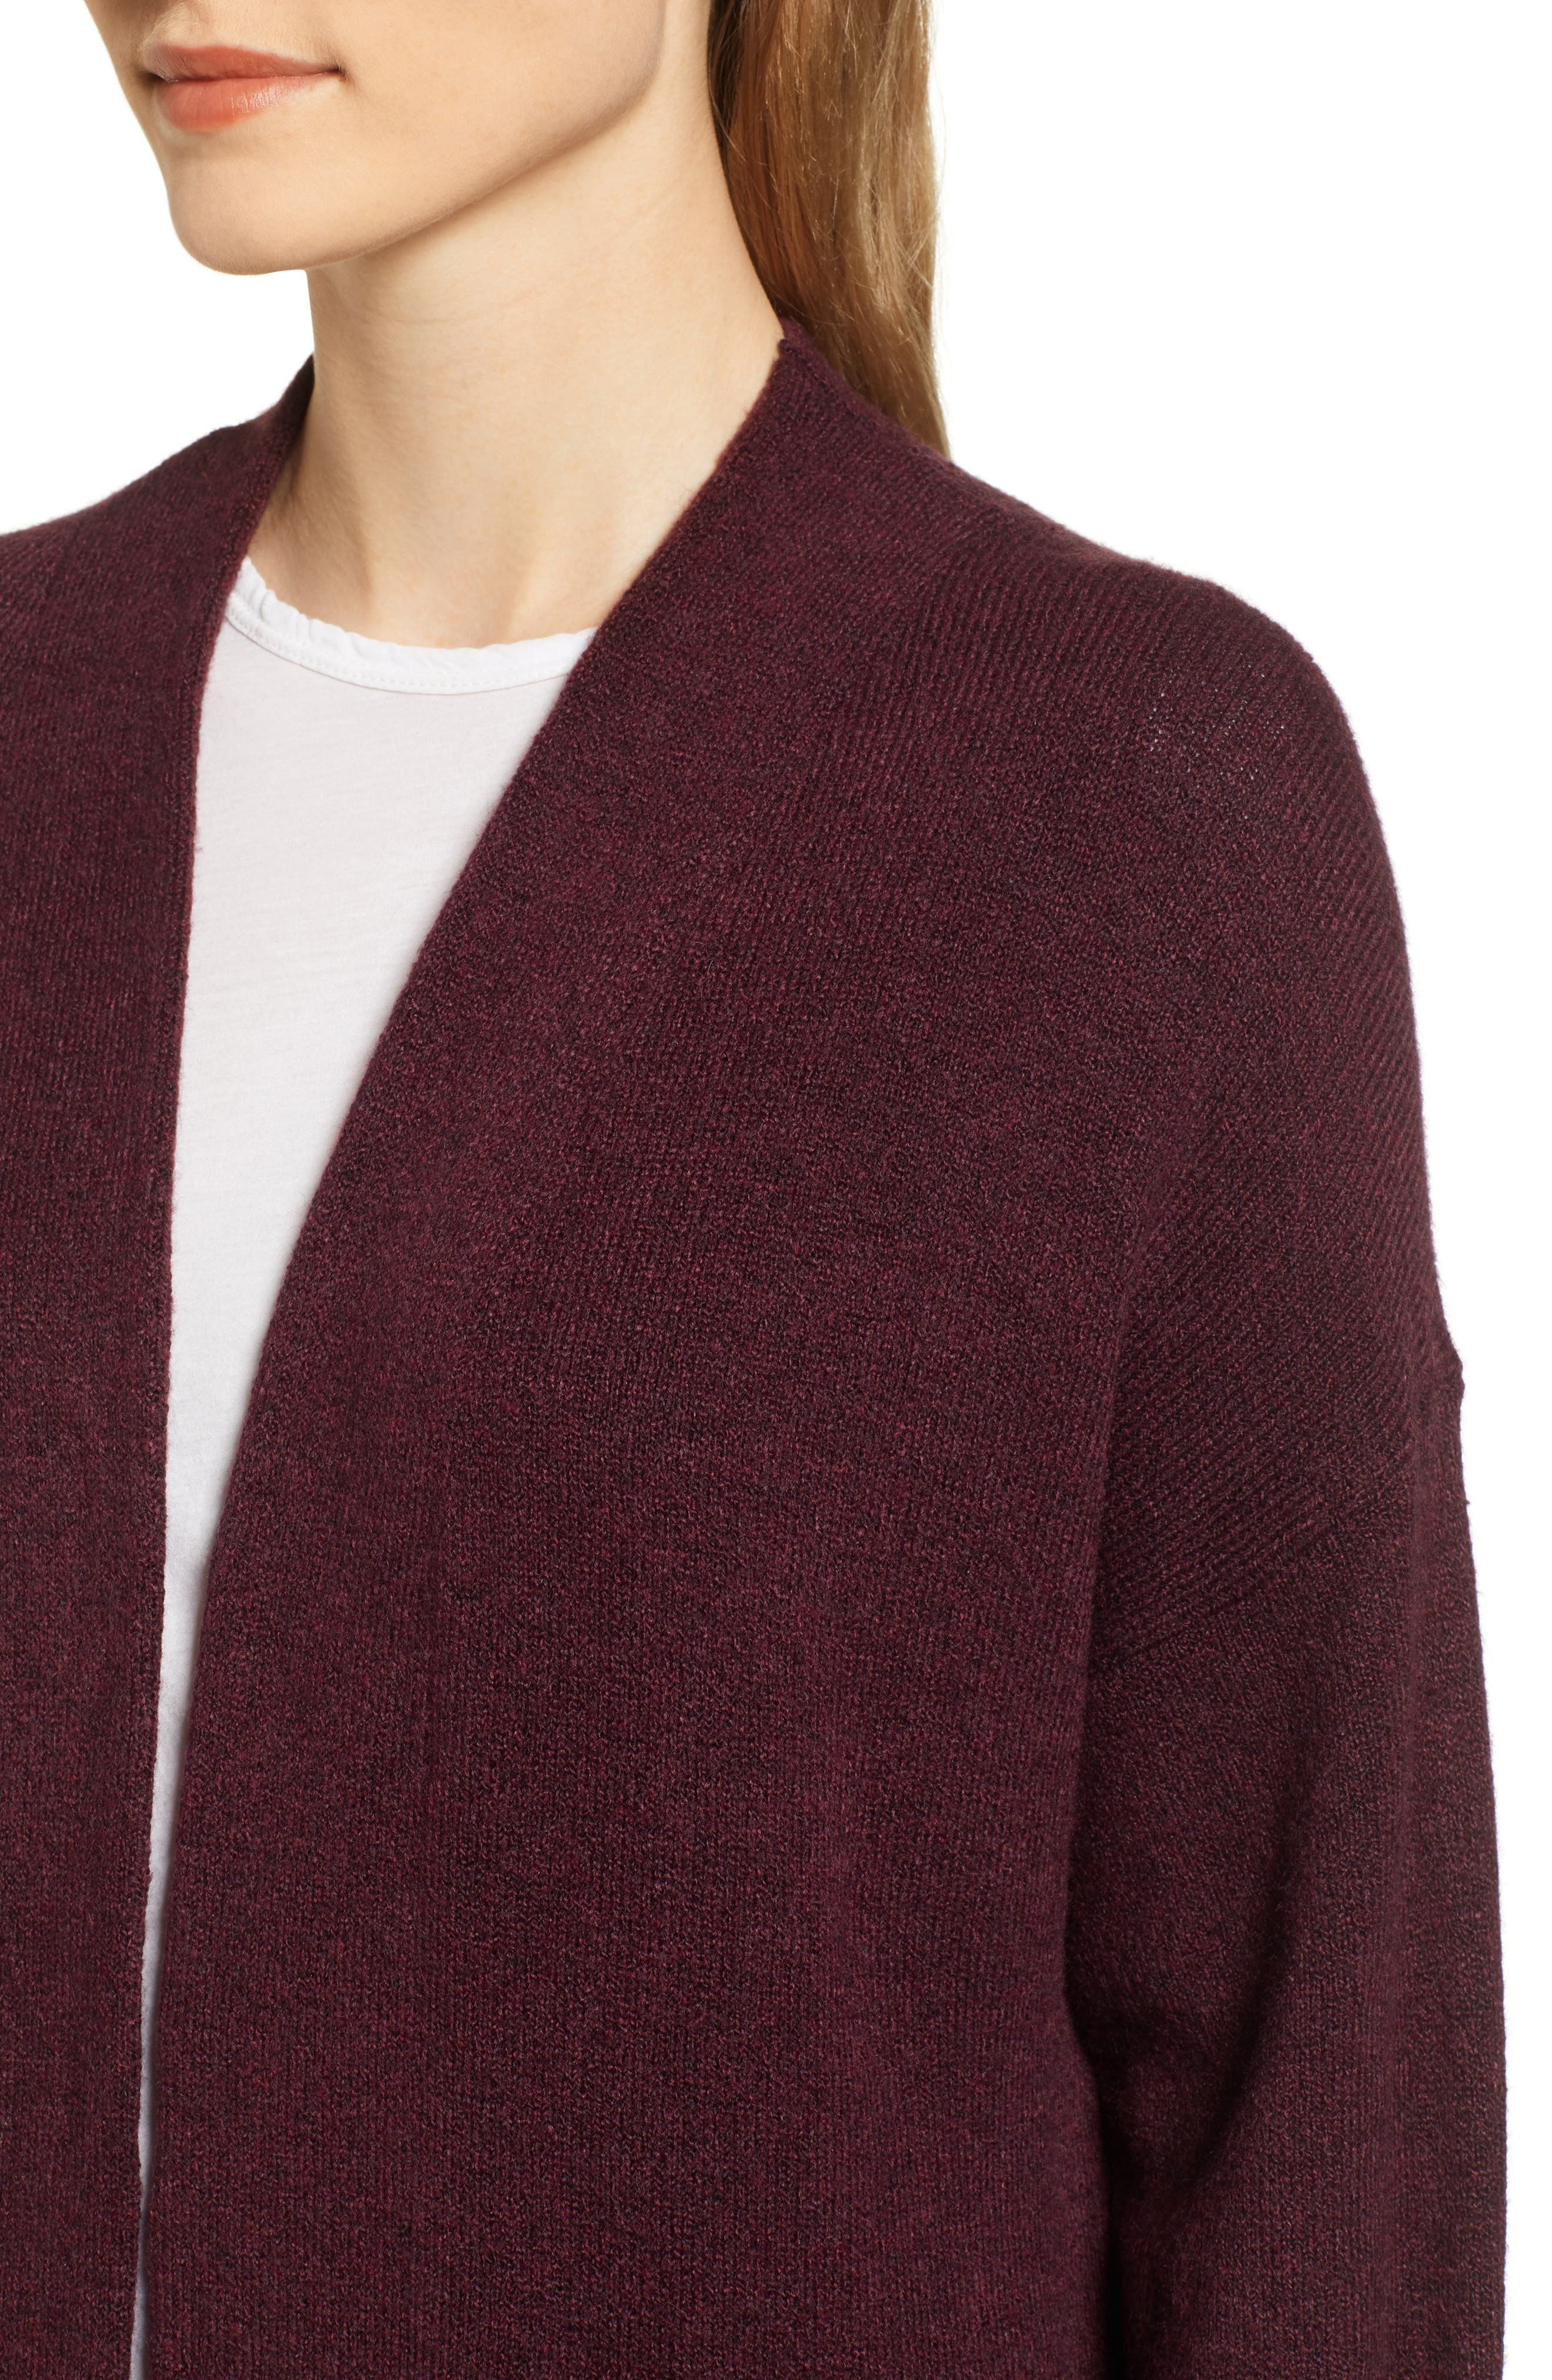 Pocket Sweater Coat,                             Alternate thumbnail 4, color,                             BURGUNDY TO MATCH DRESS